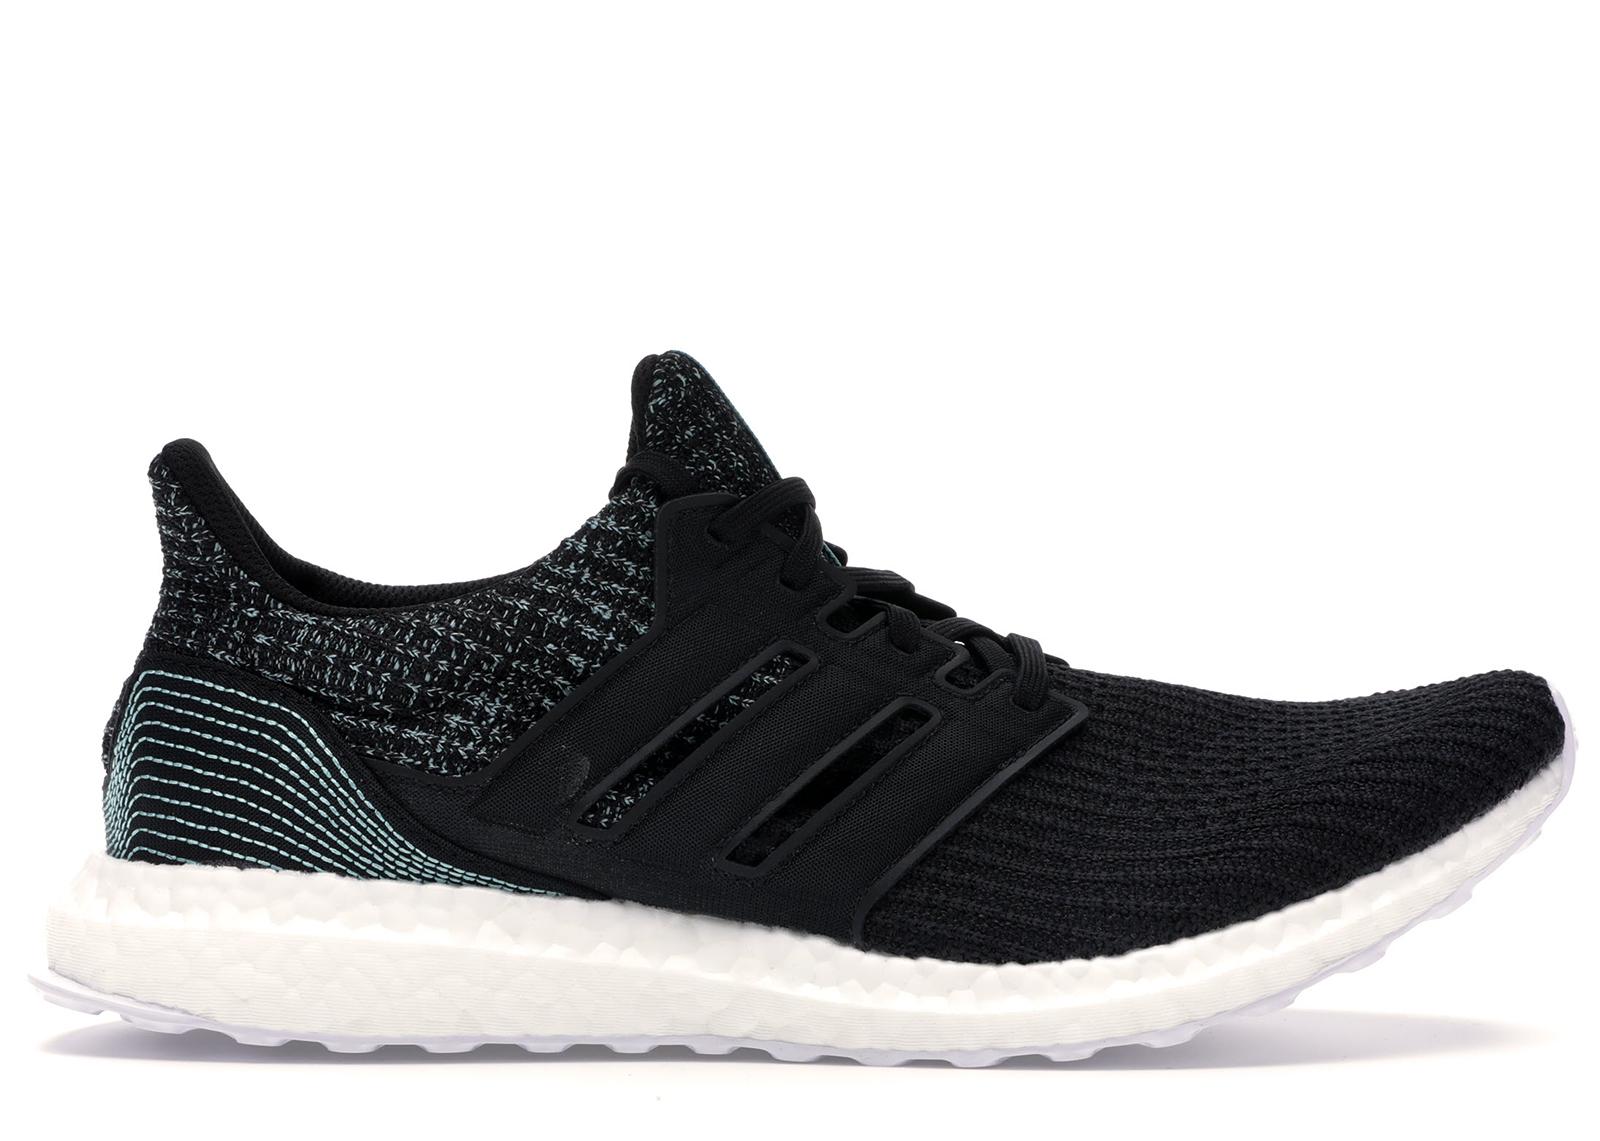 adidas ultra boost black cloud white